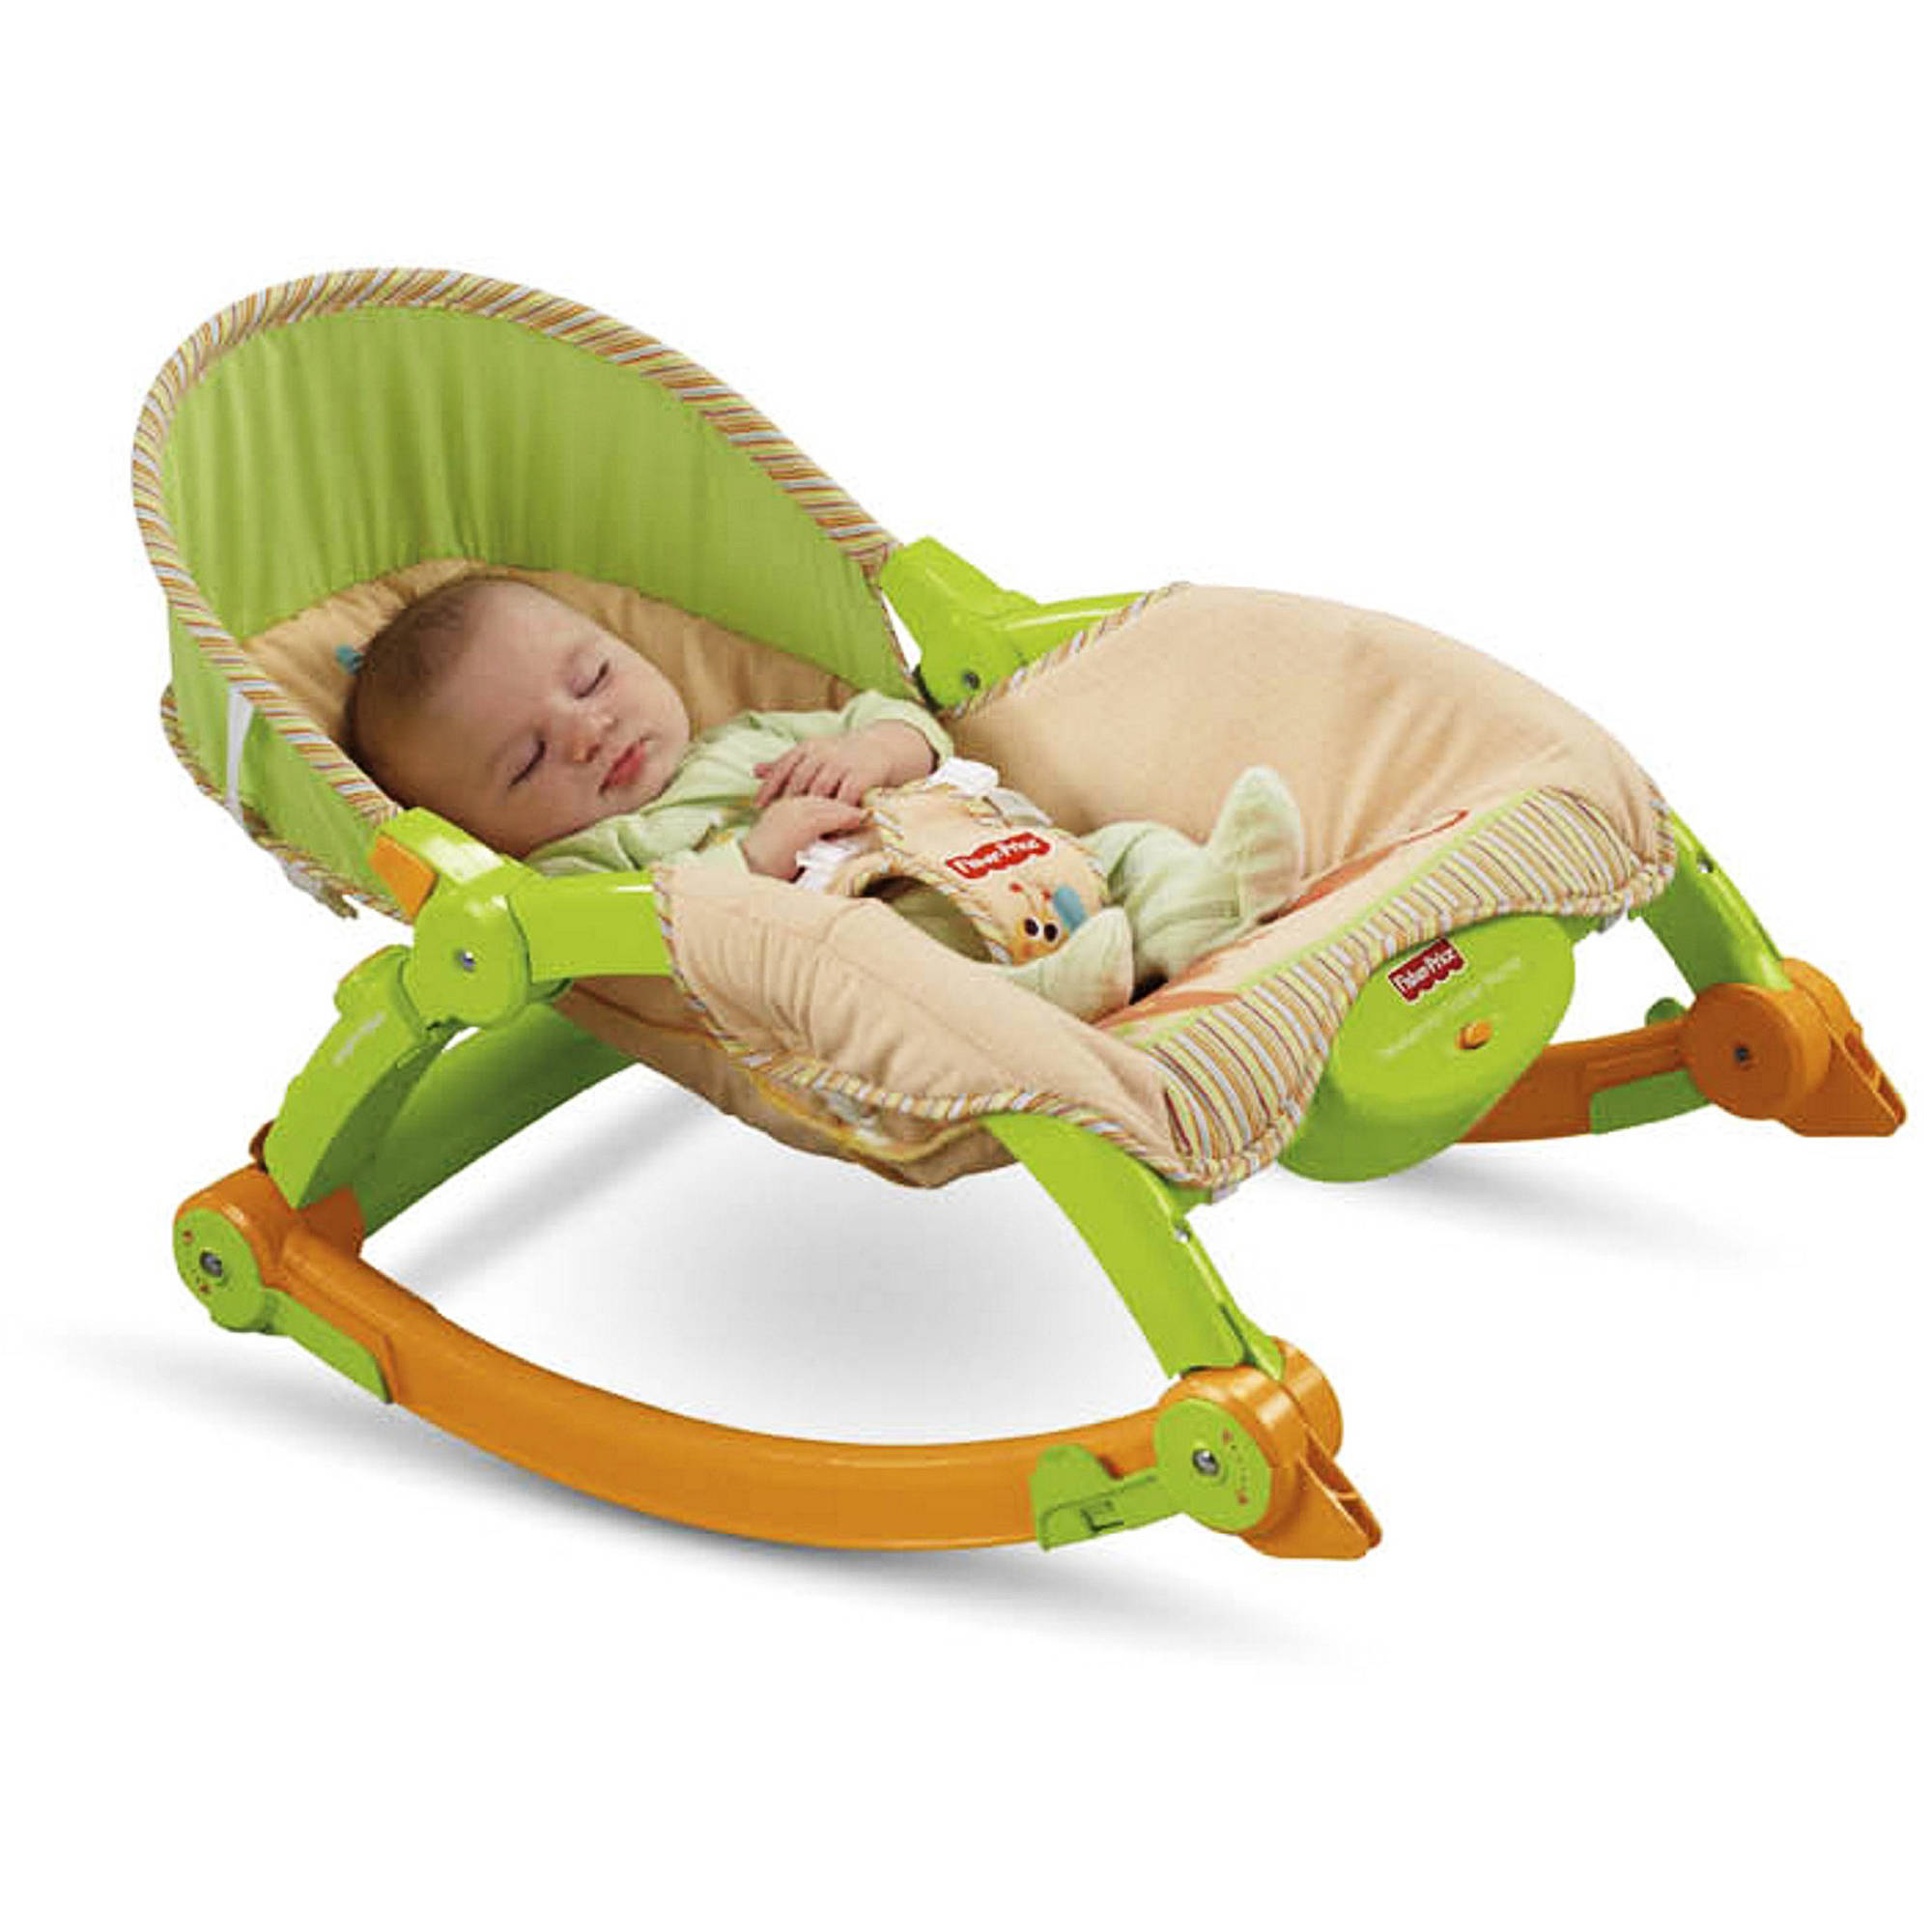 FisherPrice  Newborn to Toddler Portable Rocker